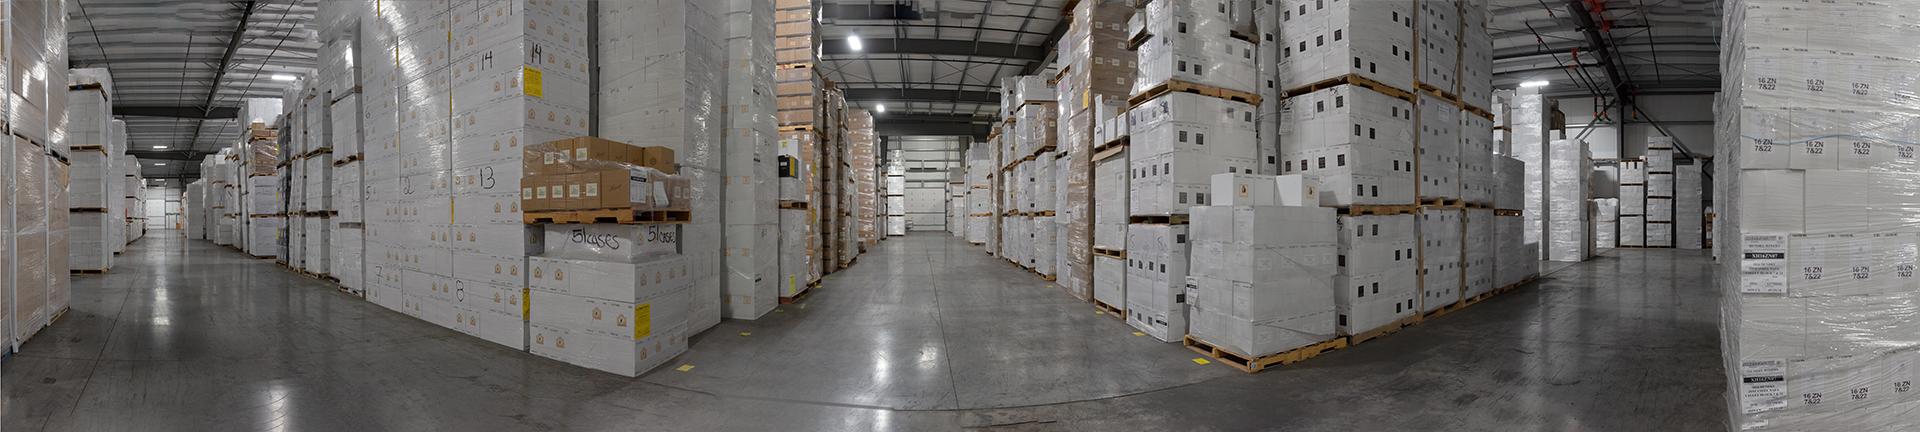 panoramic of groskopf warehouse